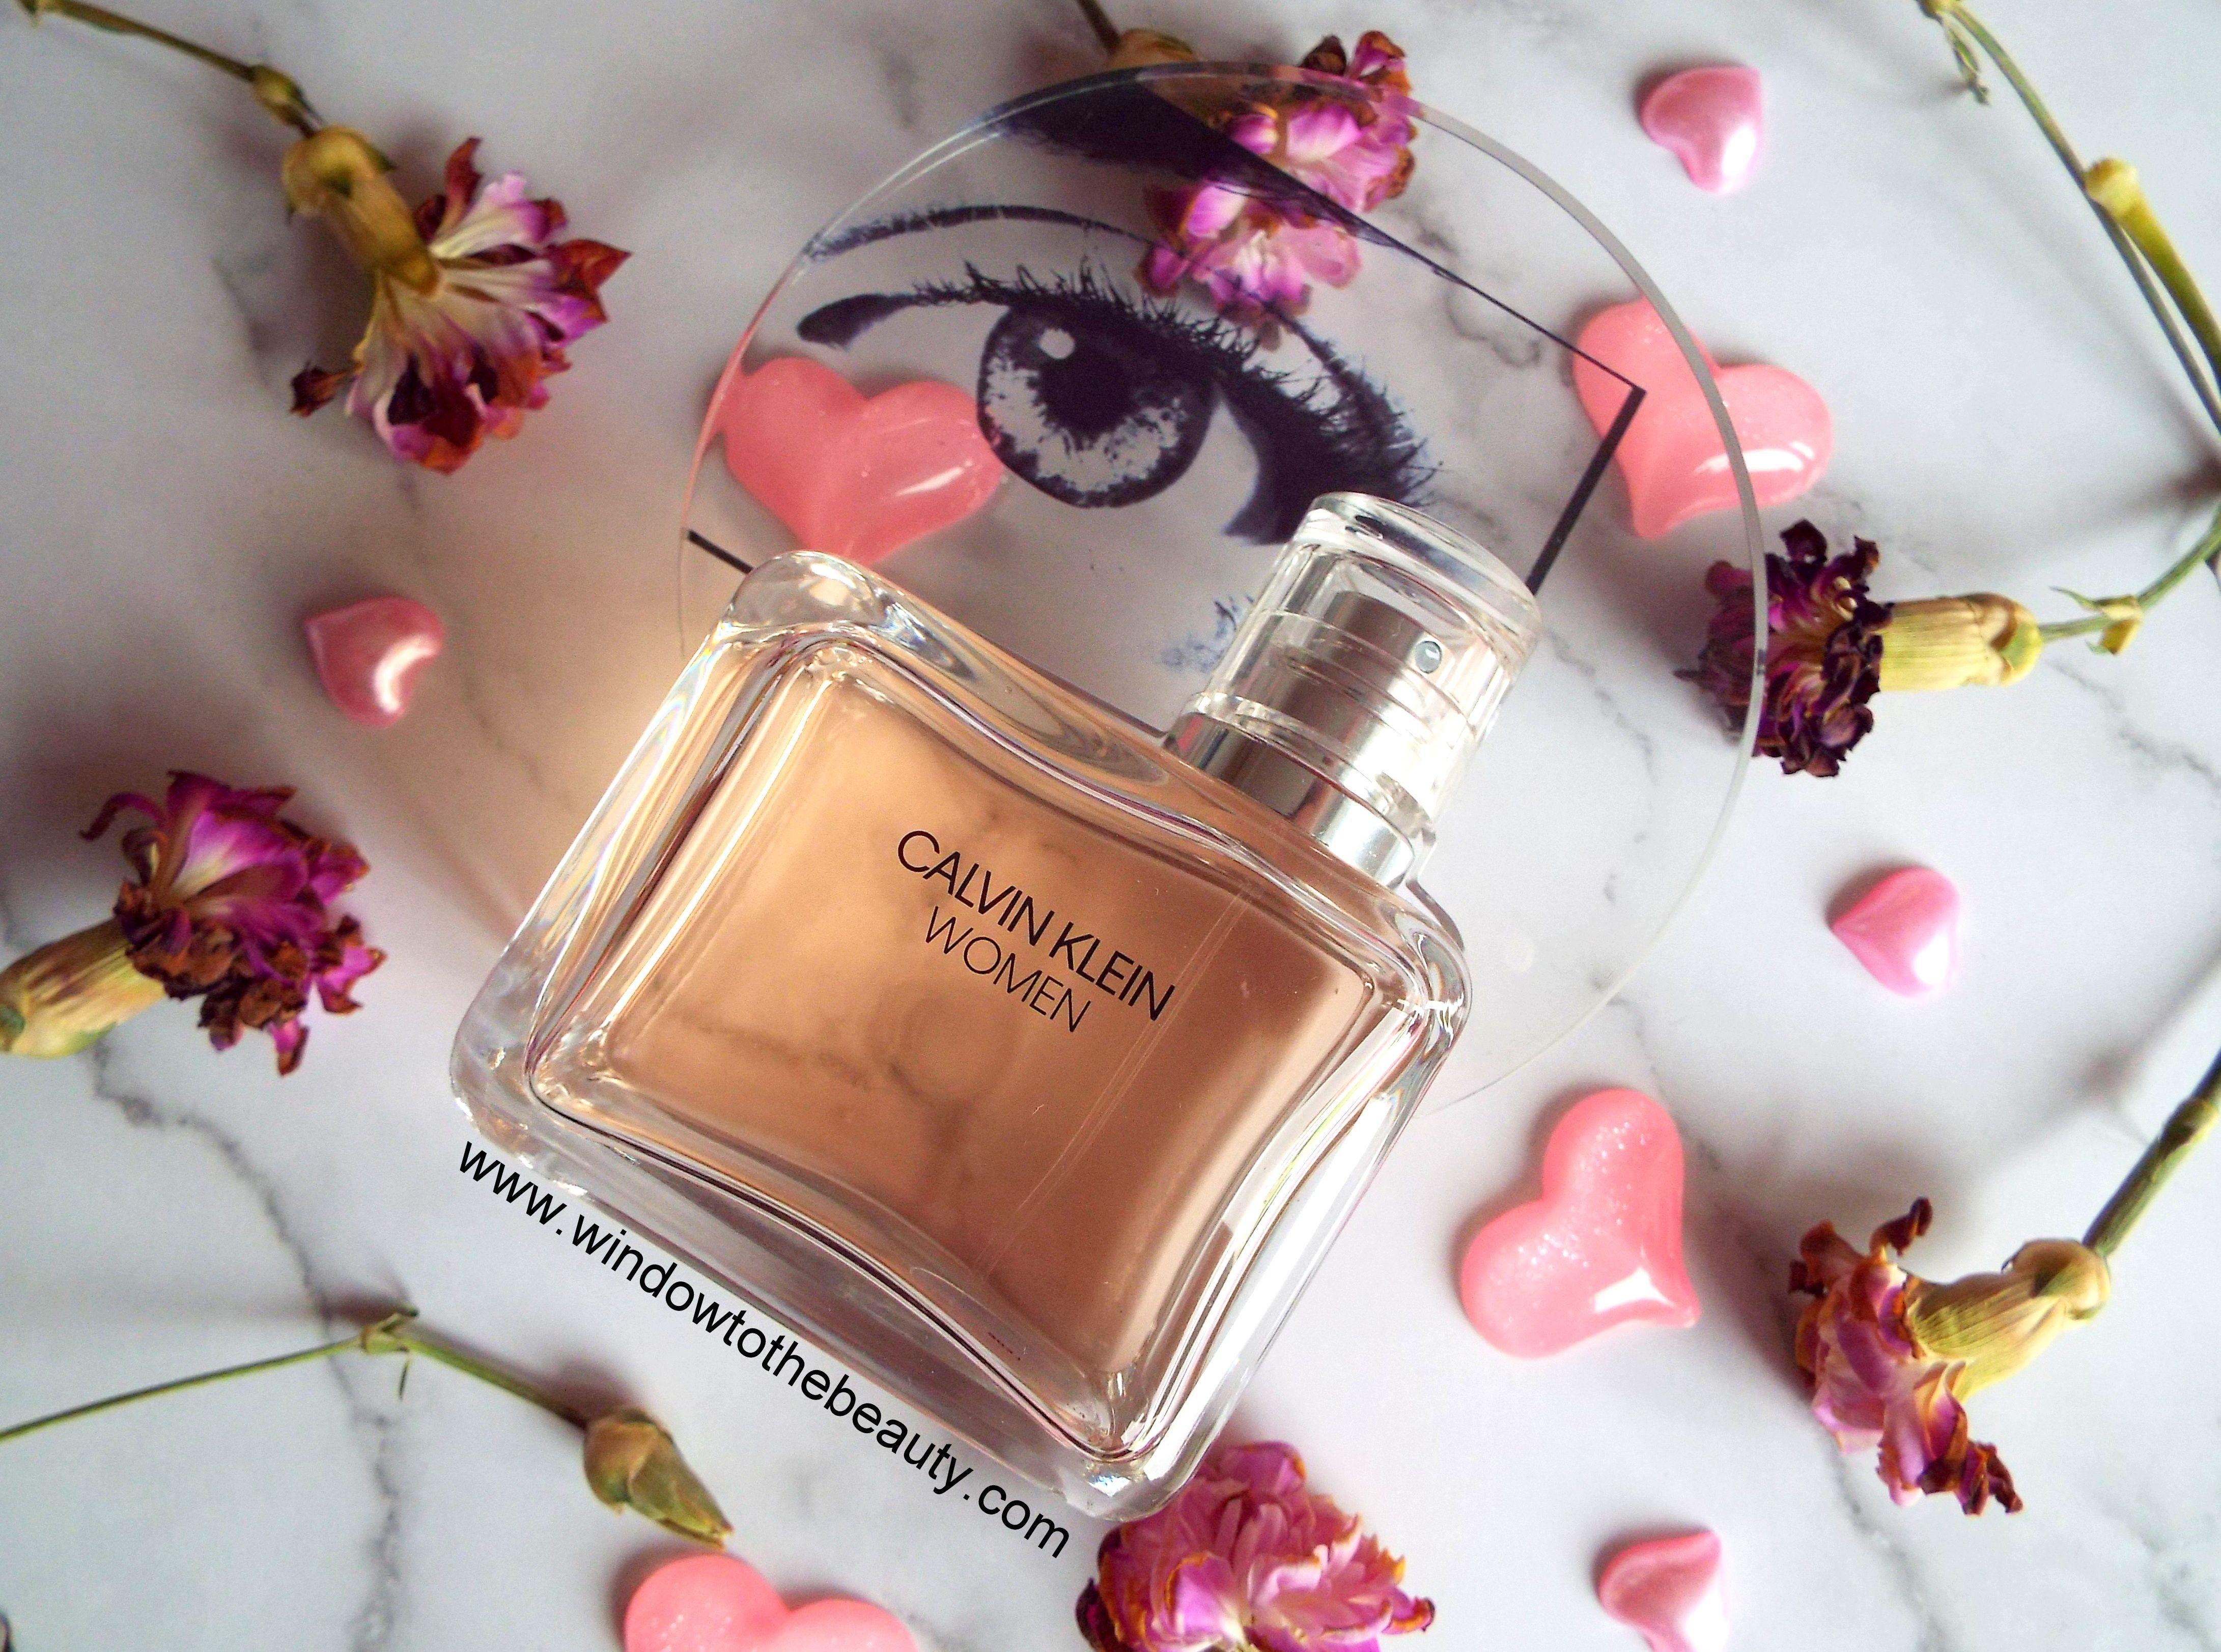 Calvin Klein Women Perfume in 2020 Eyeliner reviews, Eye